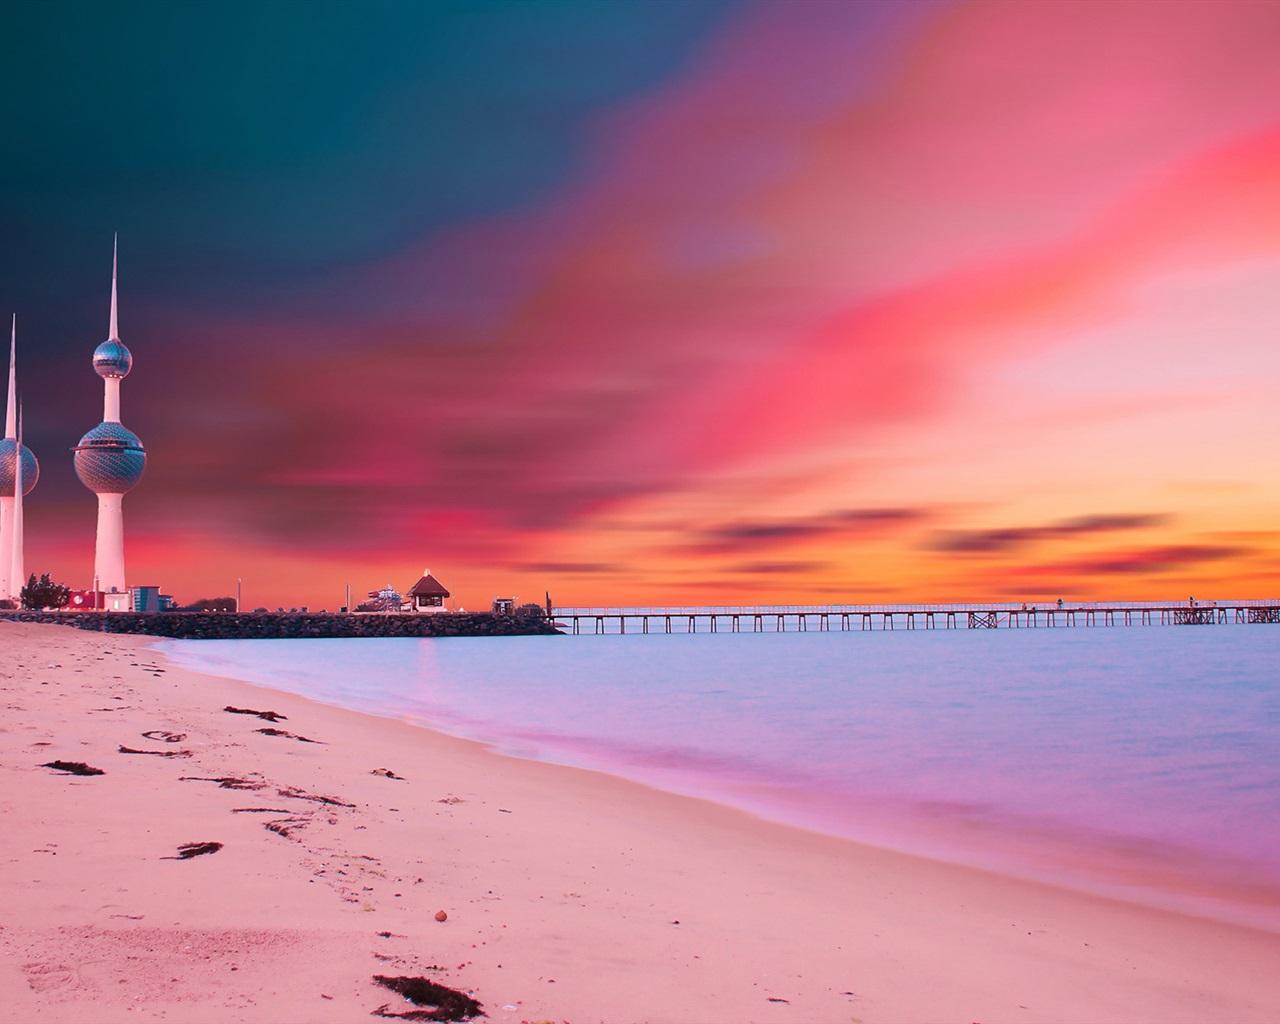 Download wallpaper 1280x1024 kuwait towers sunset bridge for Home wallpaper kuwait